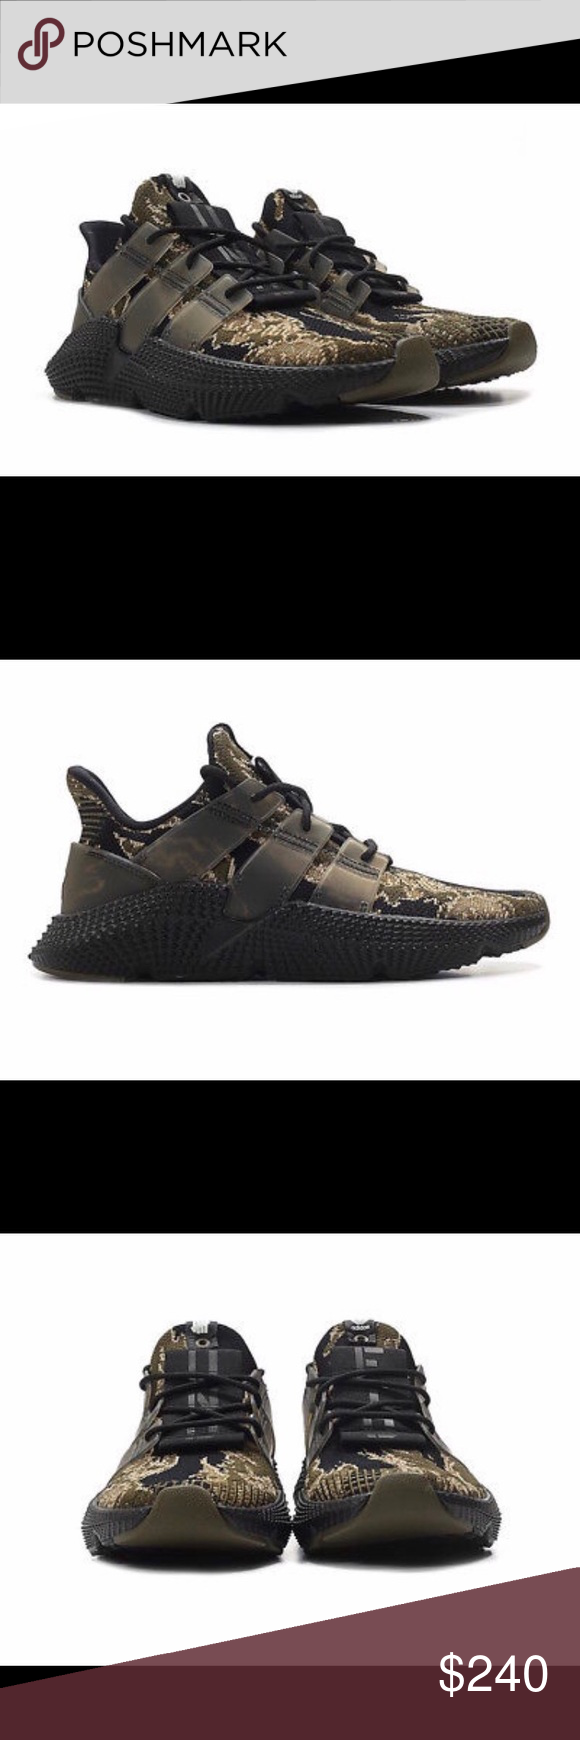 Adidas Limitata X Undftd Prophere In Edizione Limitata Adidas Di Rara Adidas, Cliente cea041